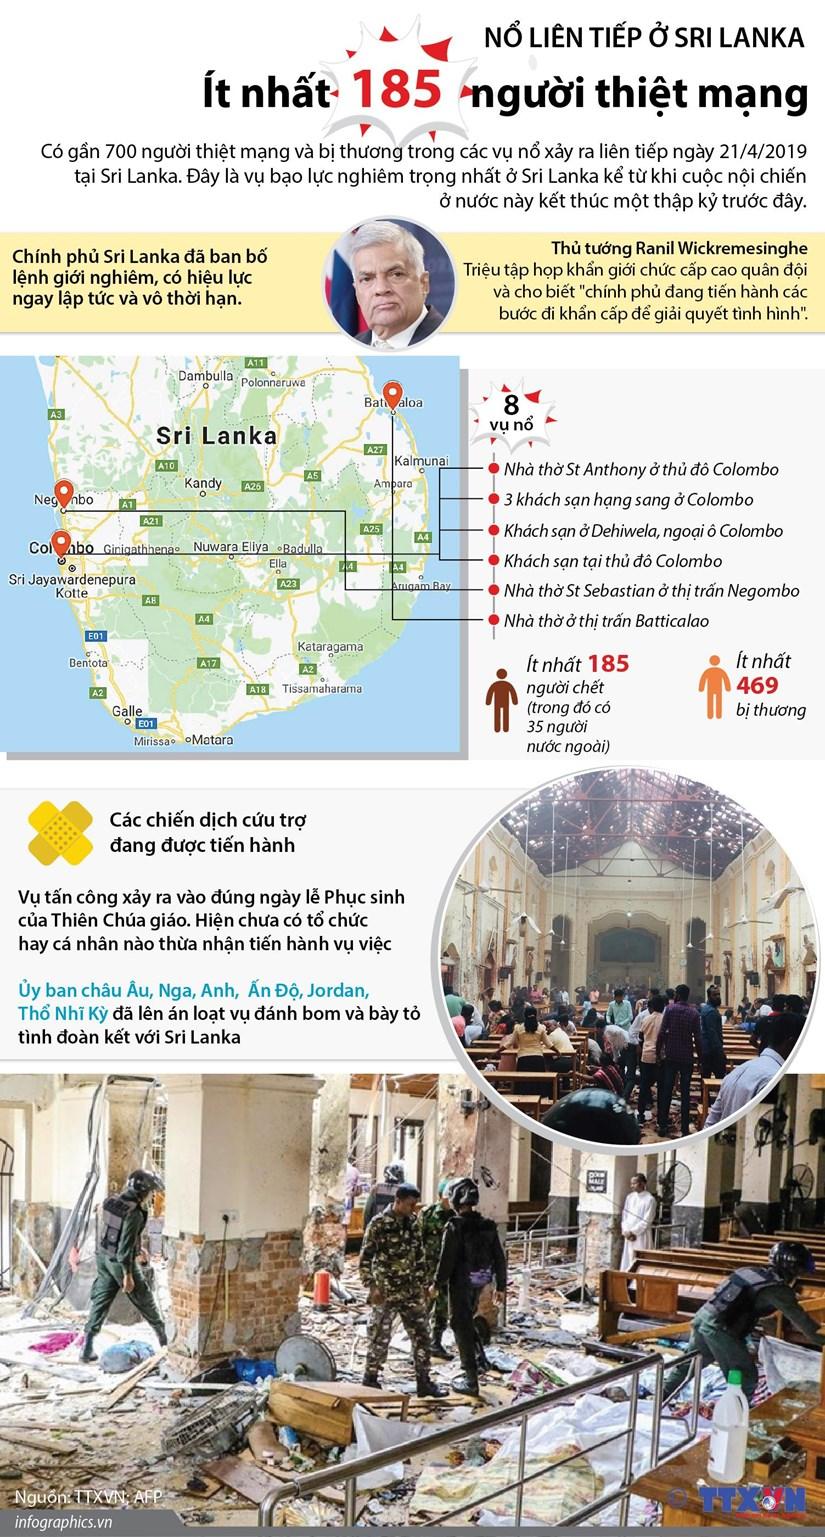 [Infographics] No lien tiep o Sri Lanka: It nhat 185 nguoi thiet mang hinh anh 1